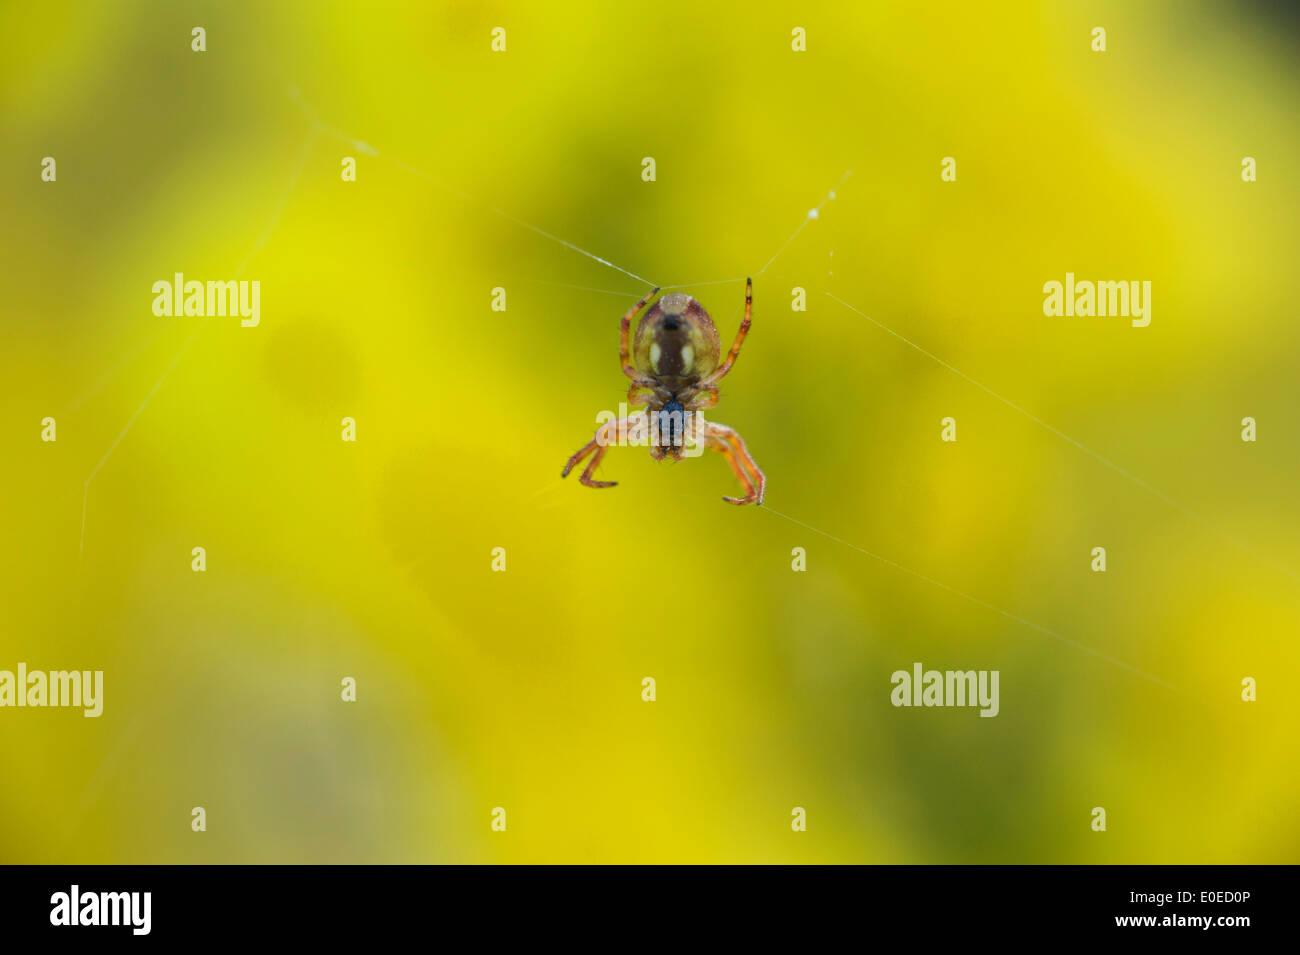 Yellow Wattle Stockfotos & Yellow Wattle Bilder - Alamy